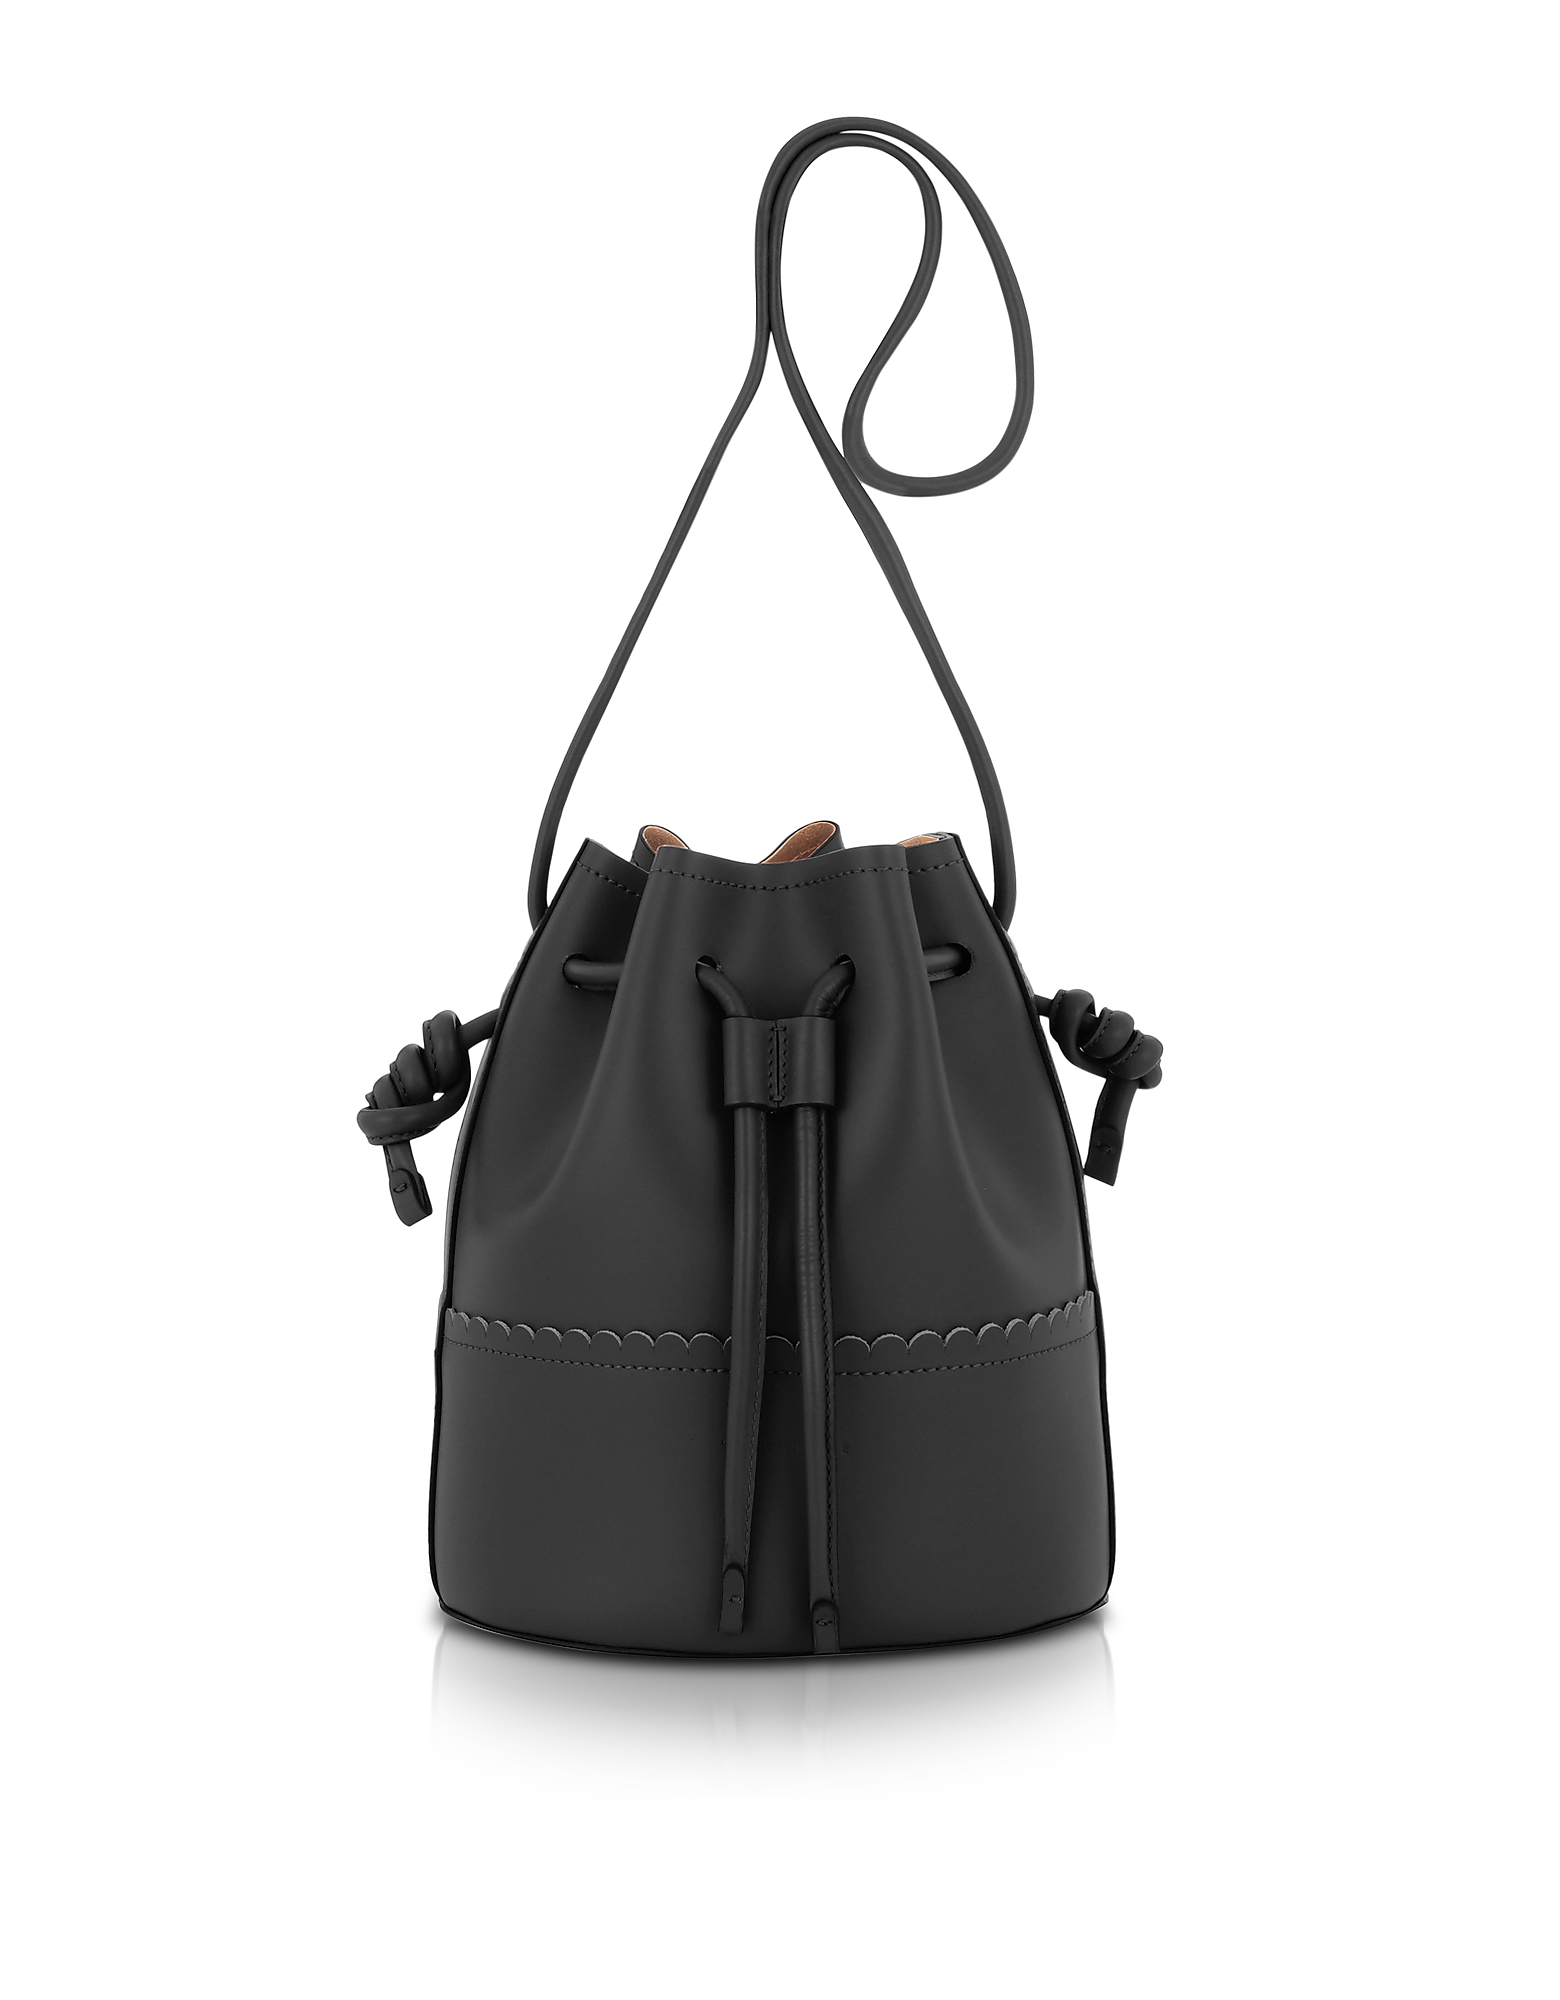 Coccinelle Handbags, Matilde Medium Leather Bucket Bag